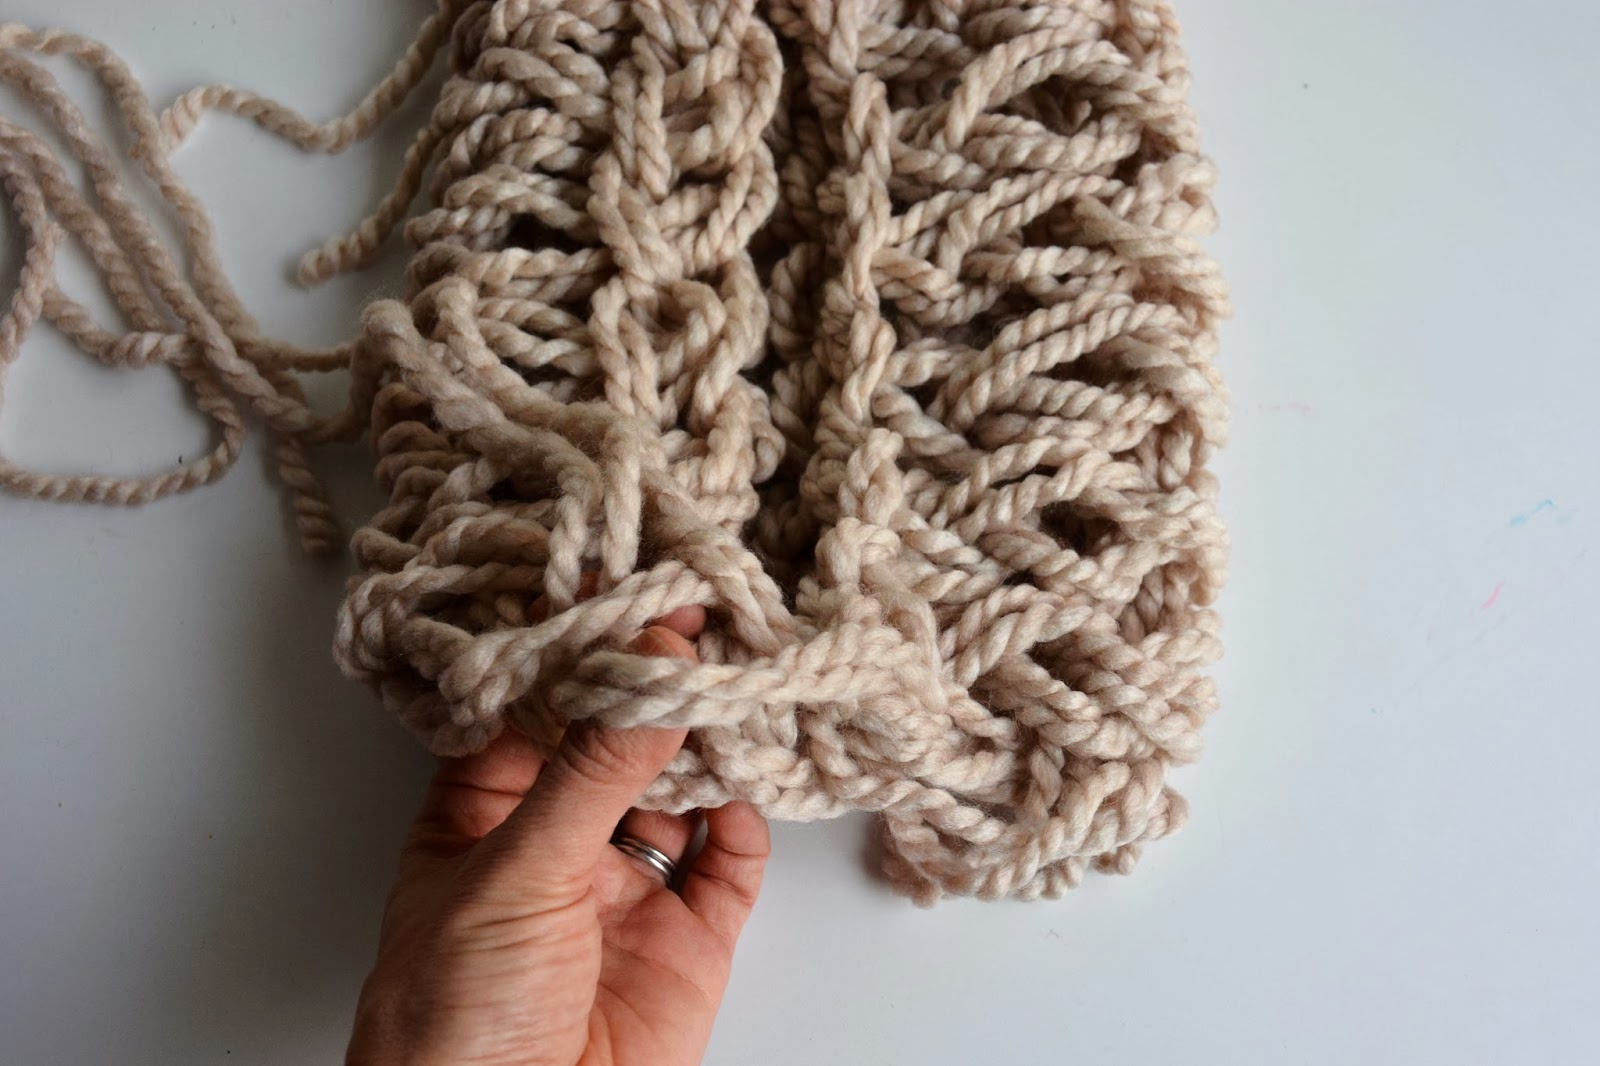 Aesthetic Nest: Knitting: Arm Knit Infinity Cowl (Tutorial)